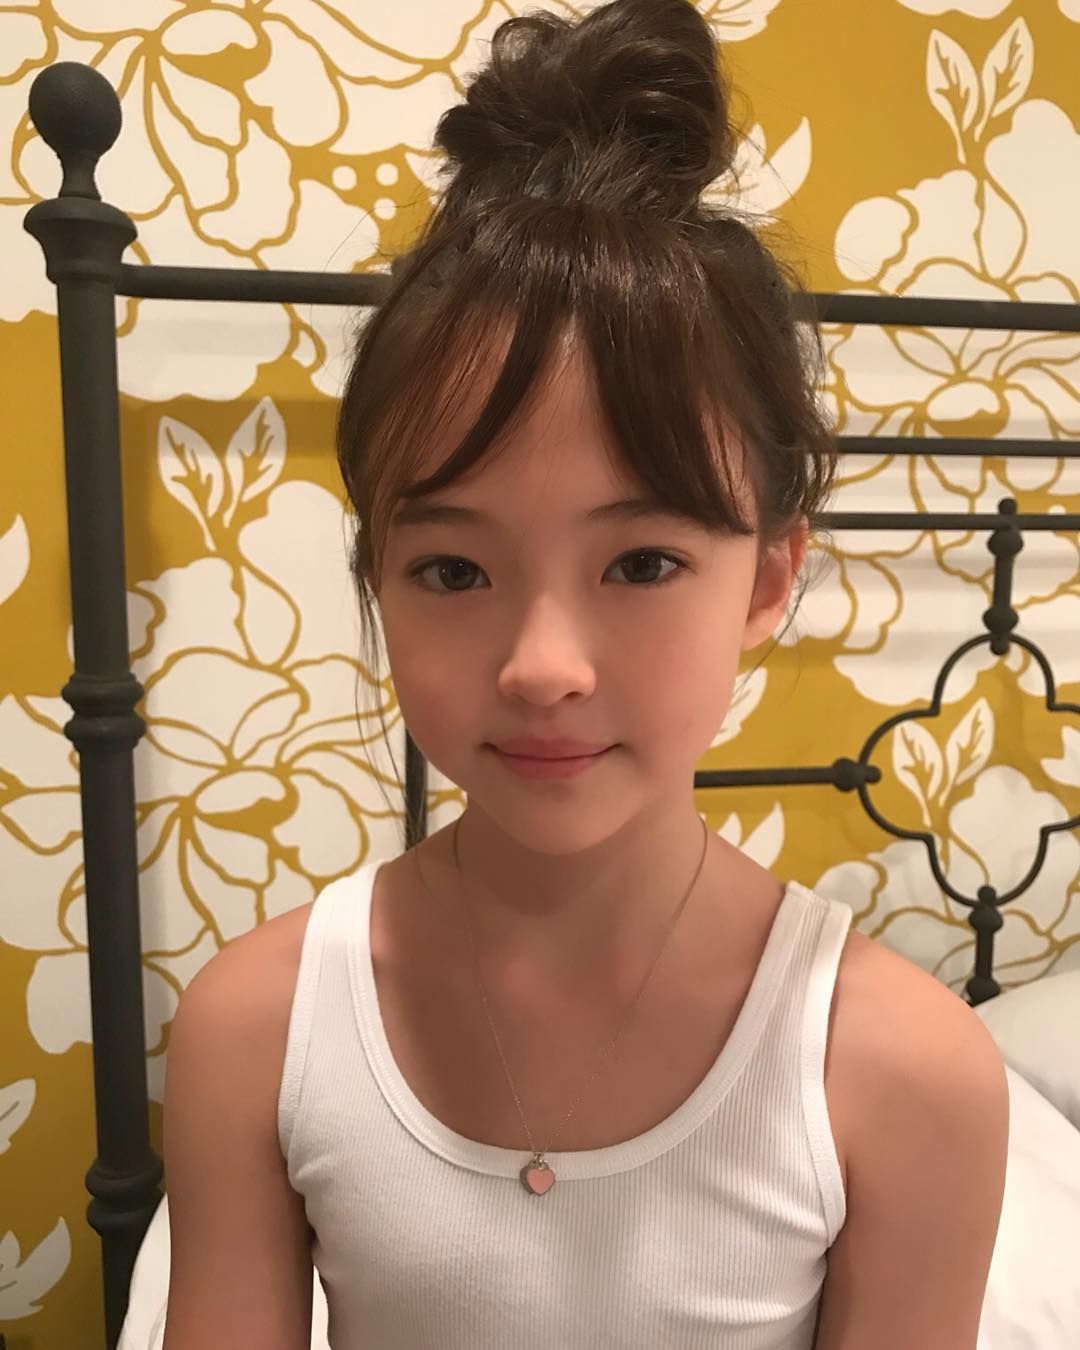 Gambar Mungkin Berisi 1 Orang Berdiri: Best 10 The Prettiest Child Model Who Resembles BLACKPINK Jennie!